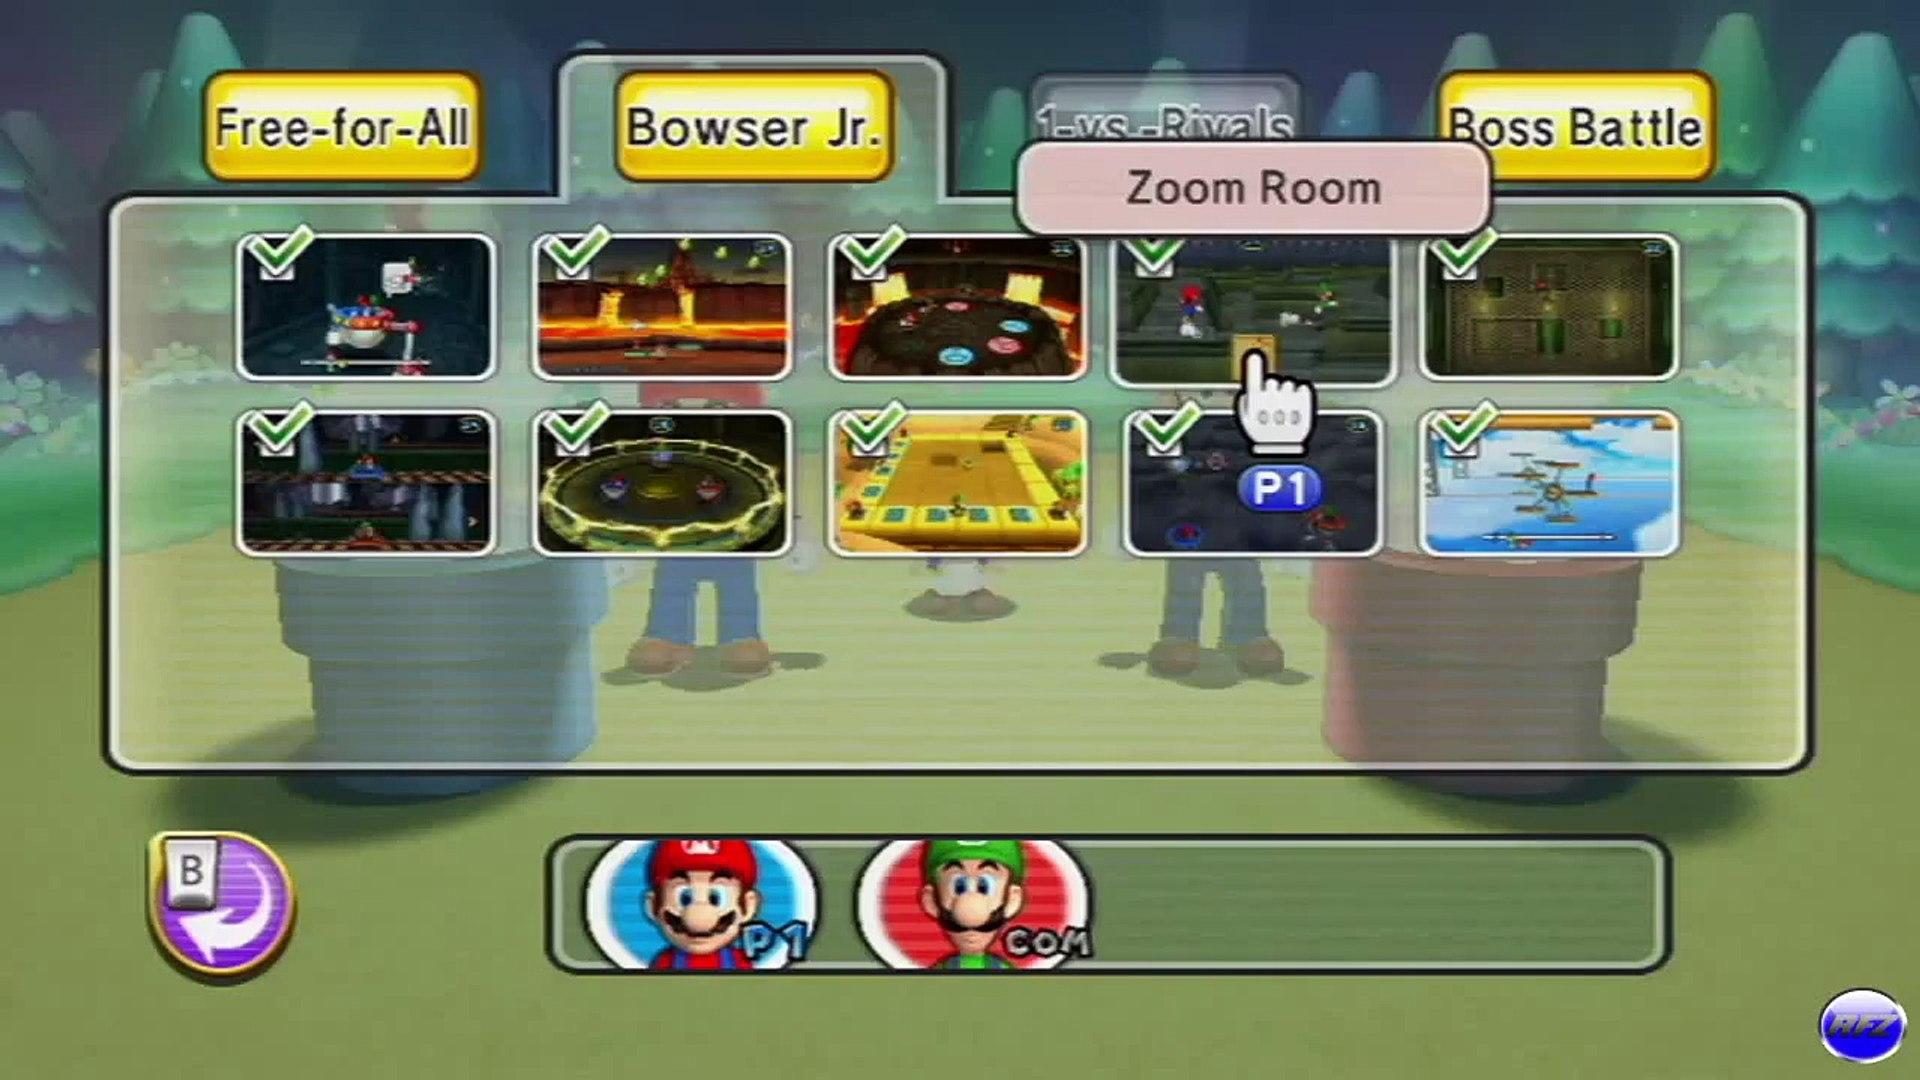 Mario Party 9 Zoom Room Vs Bowser Jr